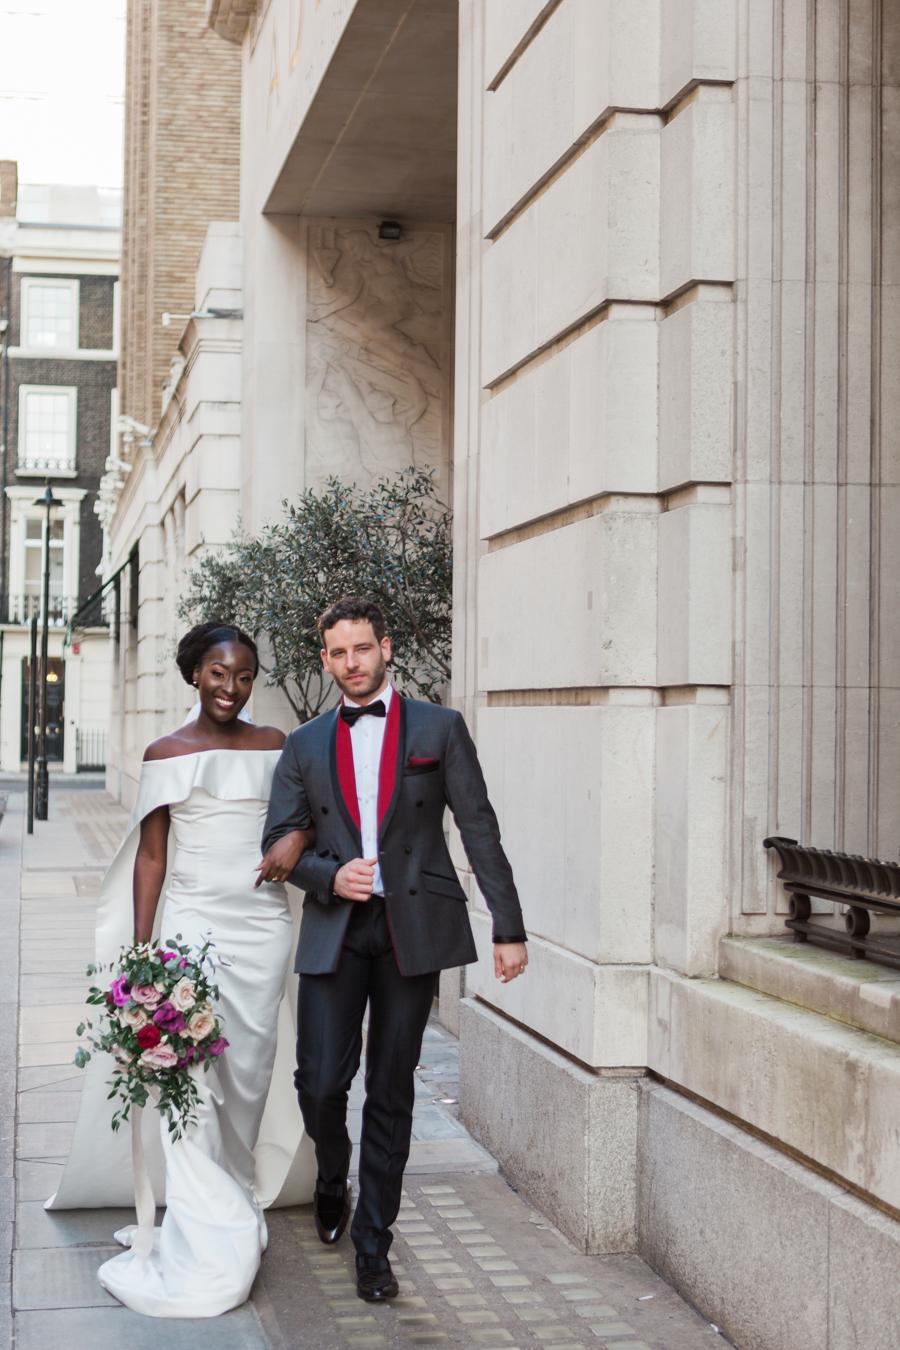 Breathtakingly beautiful - diversity wins in this stunning RSA London wedding editorial! (2)